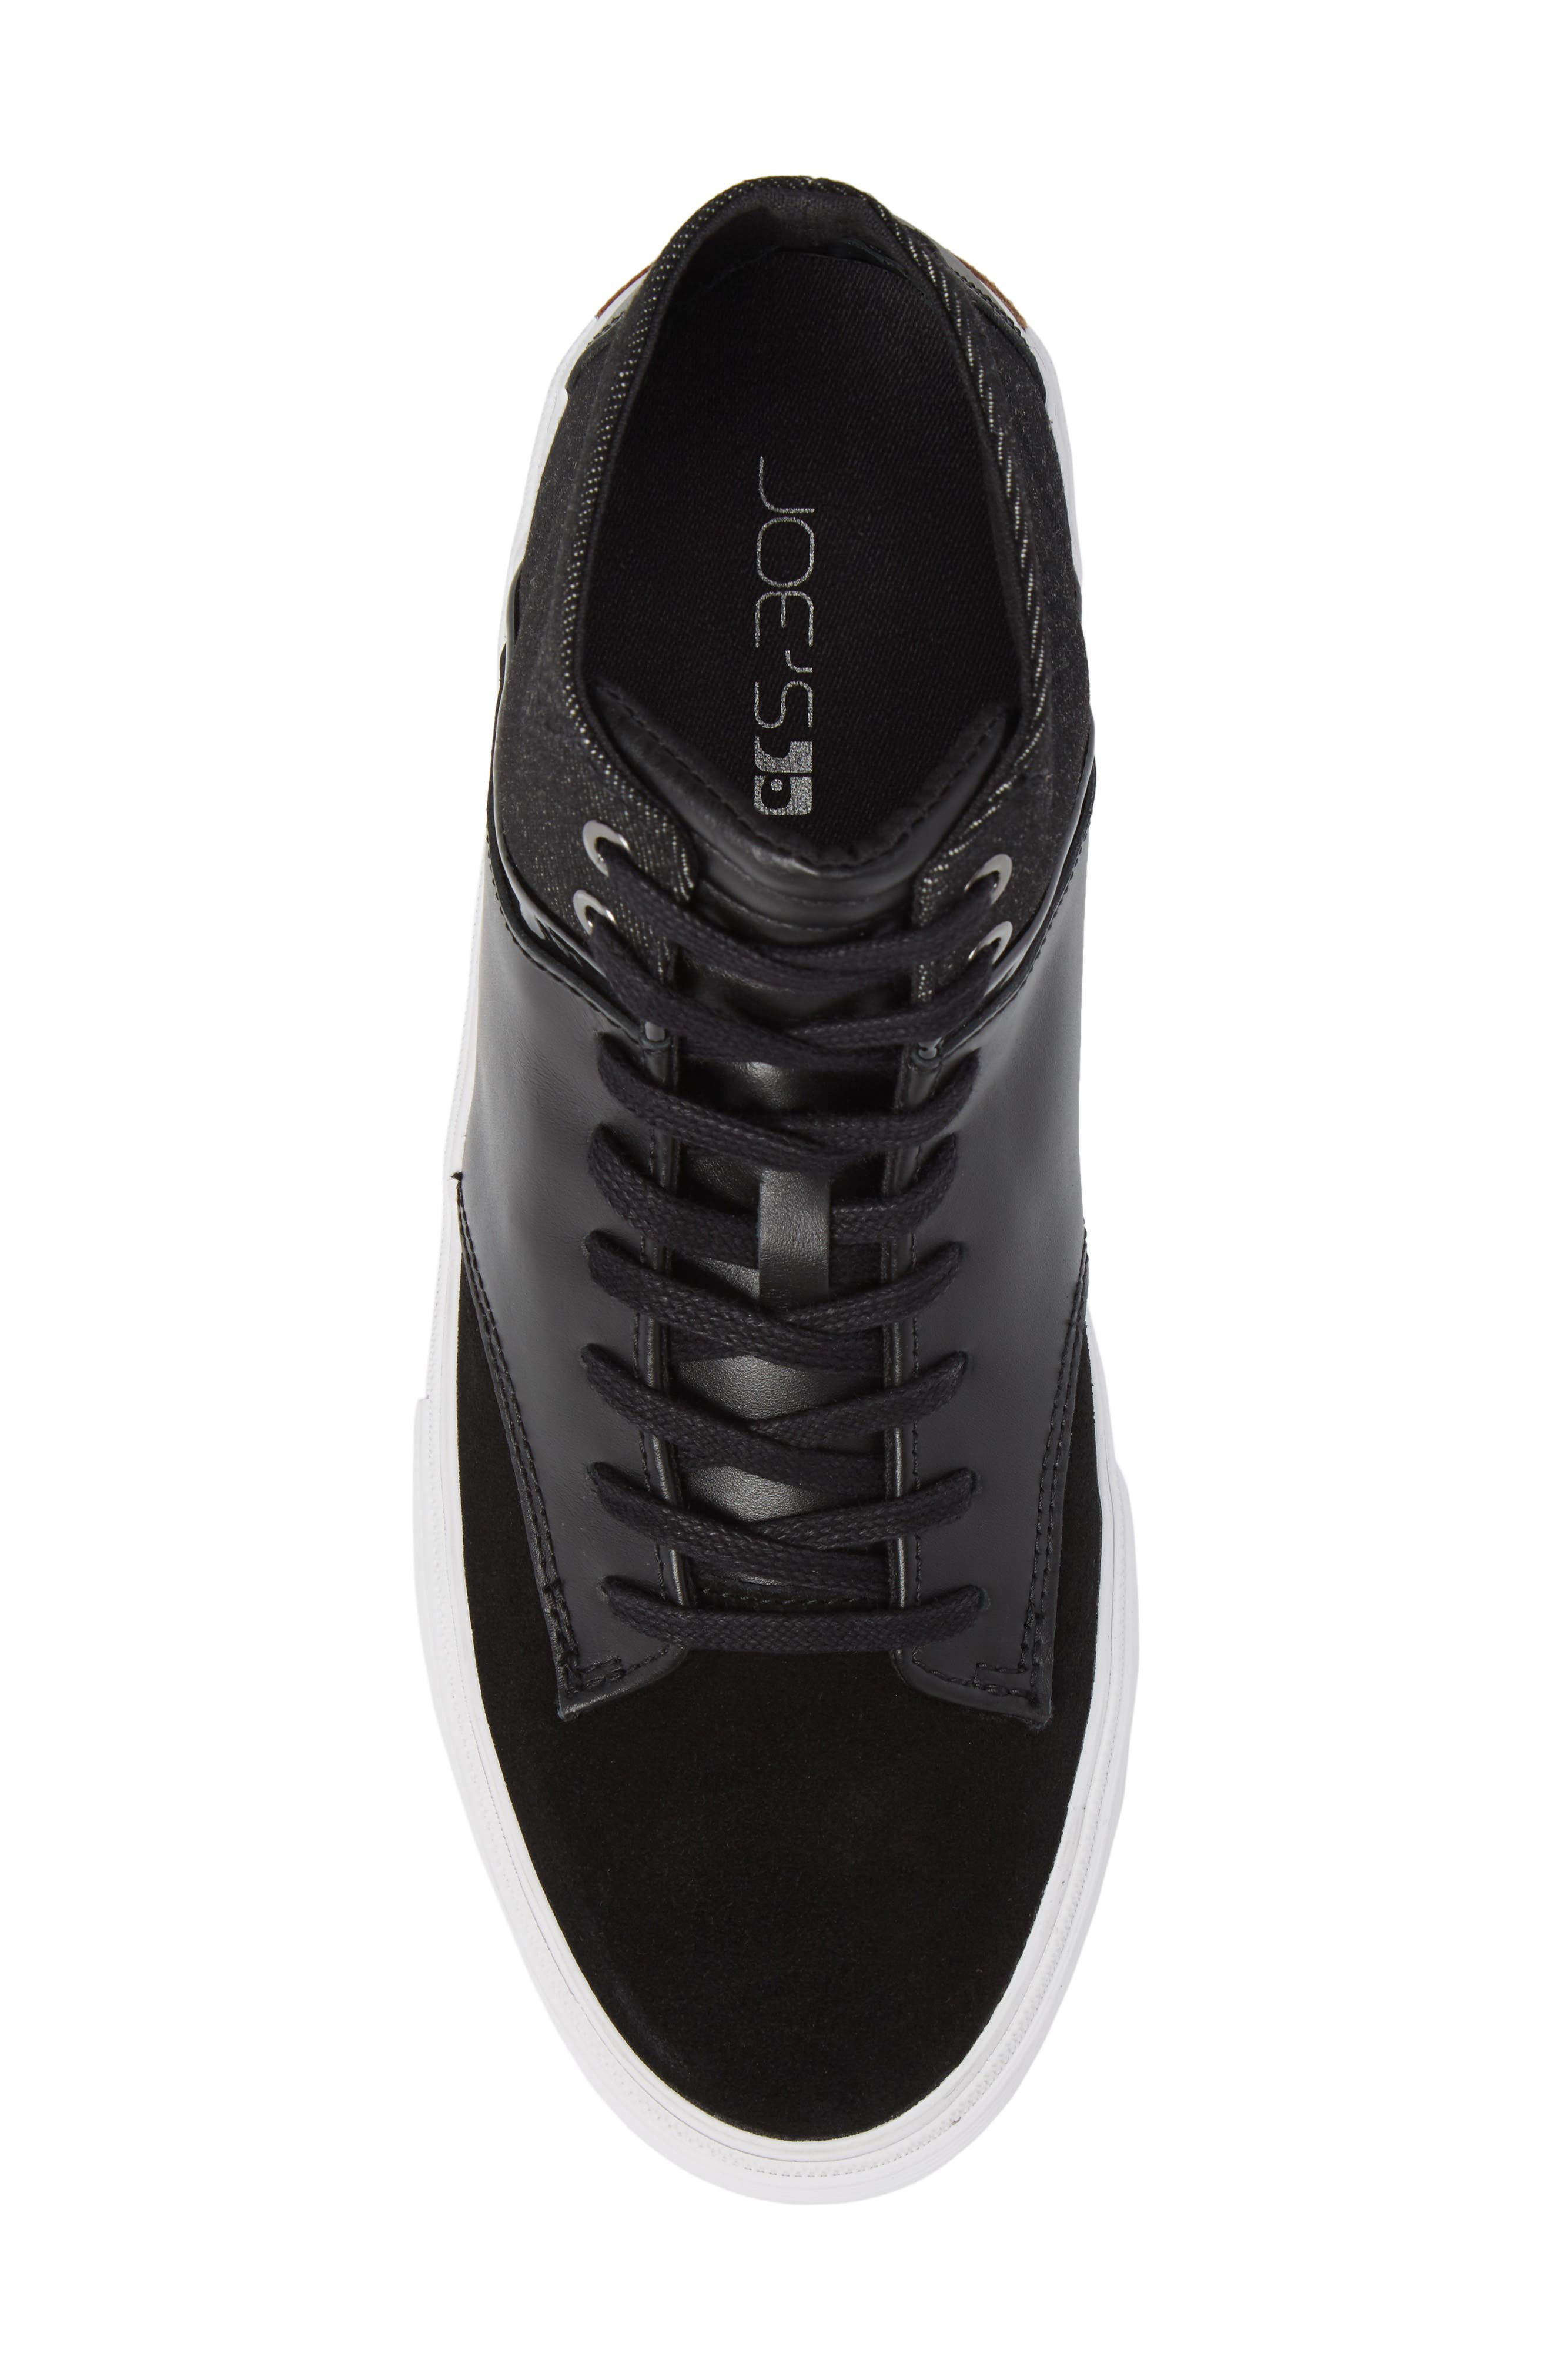 Joe Mac High Top Sneaker,                             Alternate thumbnail 5, color,                             Black Leather